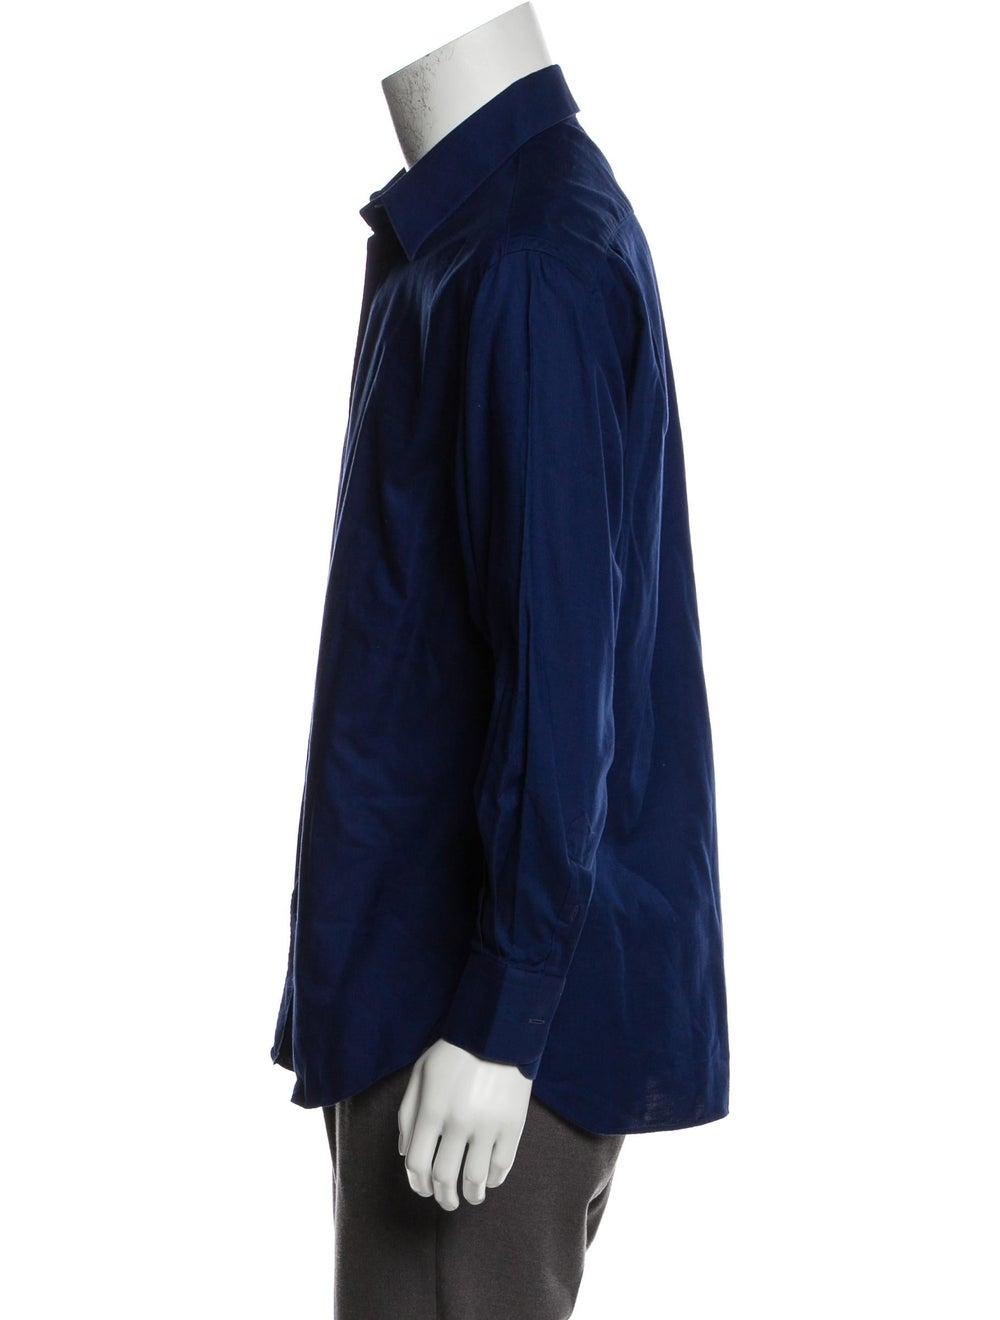 Prada Woven Button-Up Shirt - image 2